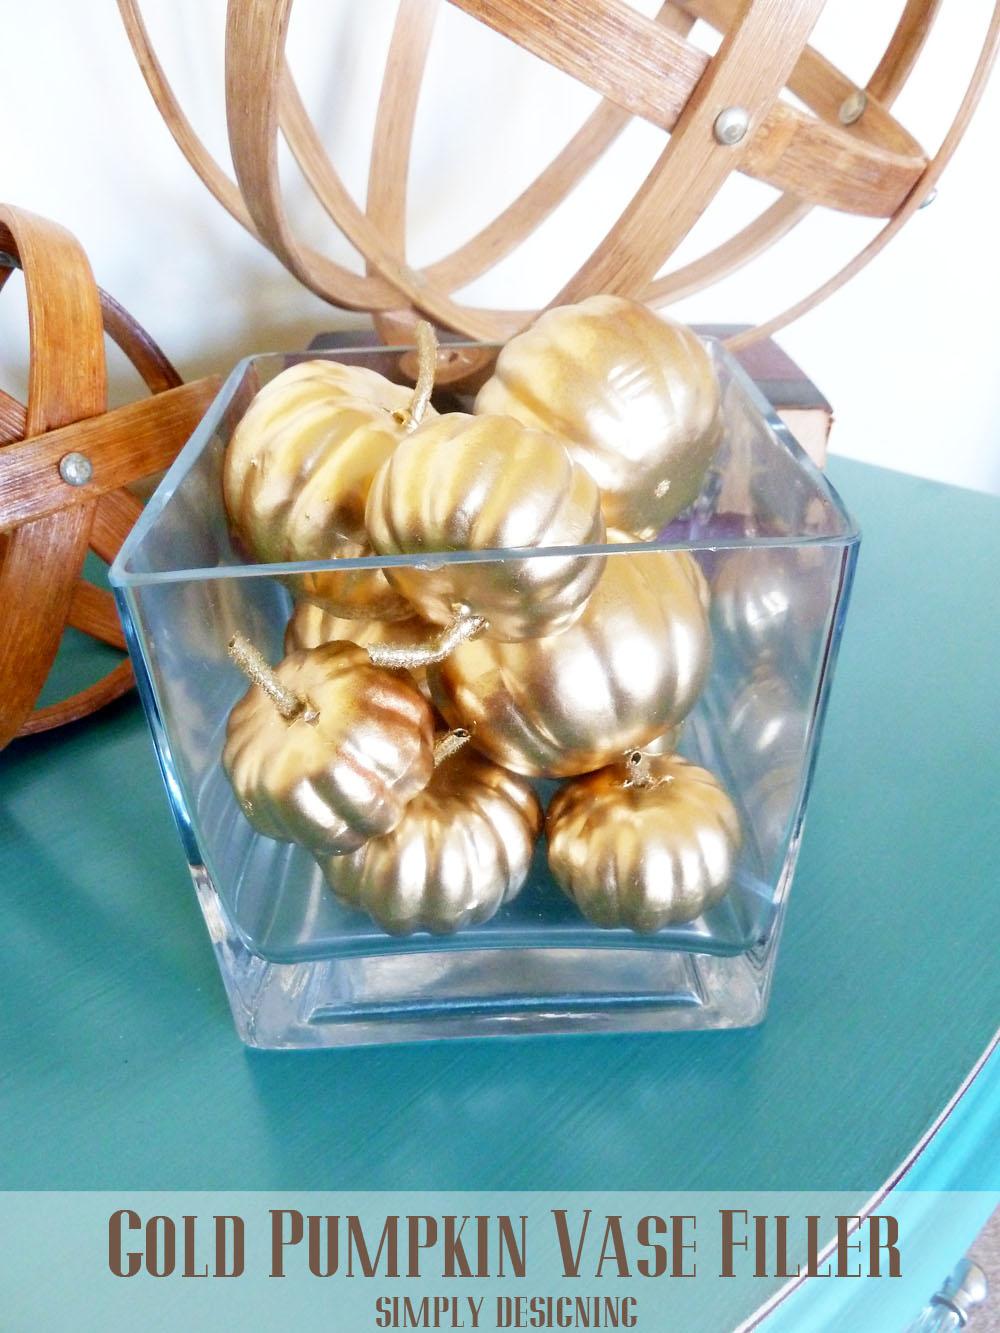 Gold pumpkin vase filler pottery barn knock off gold pumpkin vase filler diy pbknockoff fall thanksgiving gold reviewsmspy